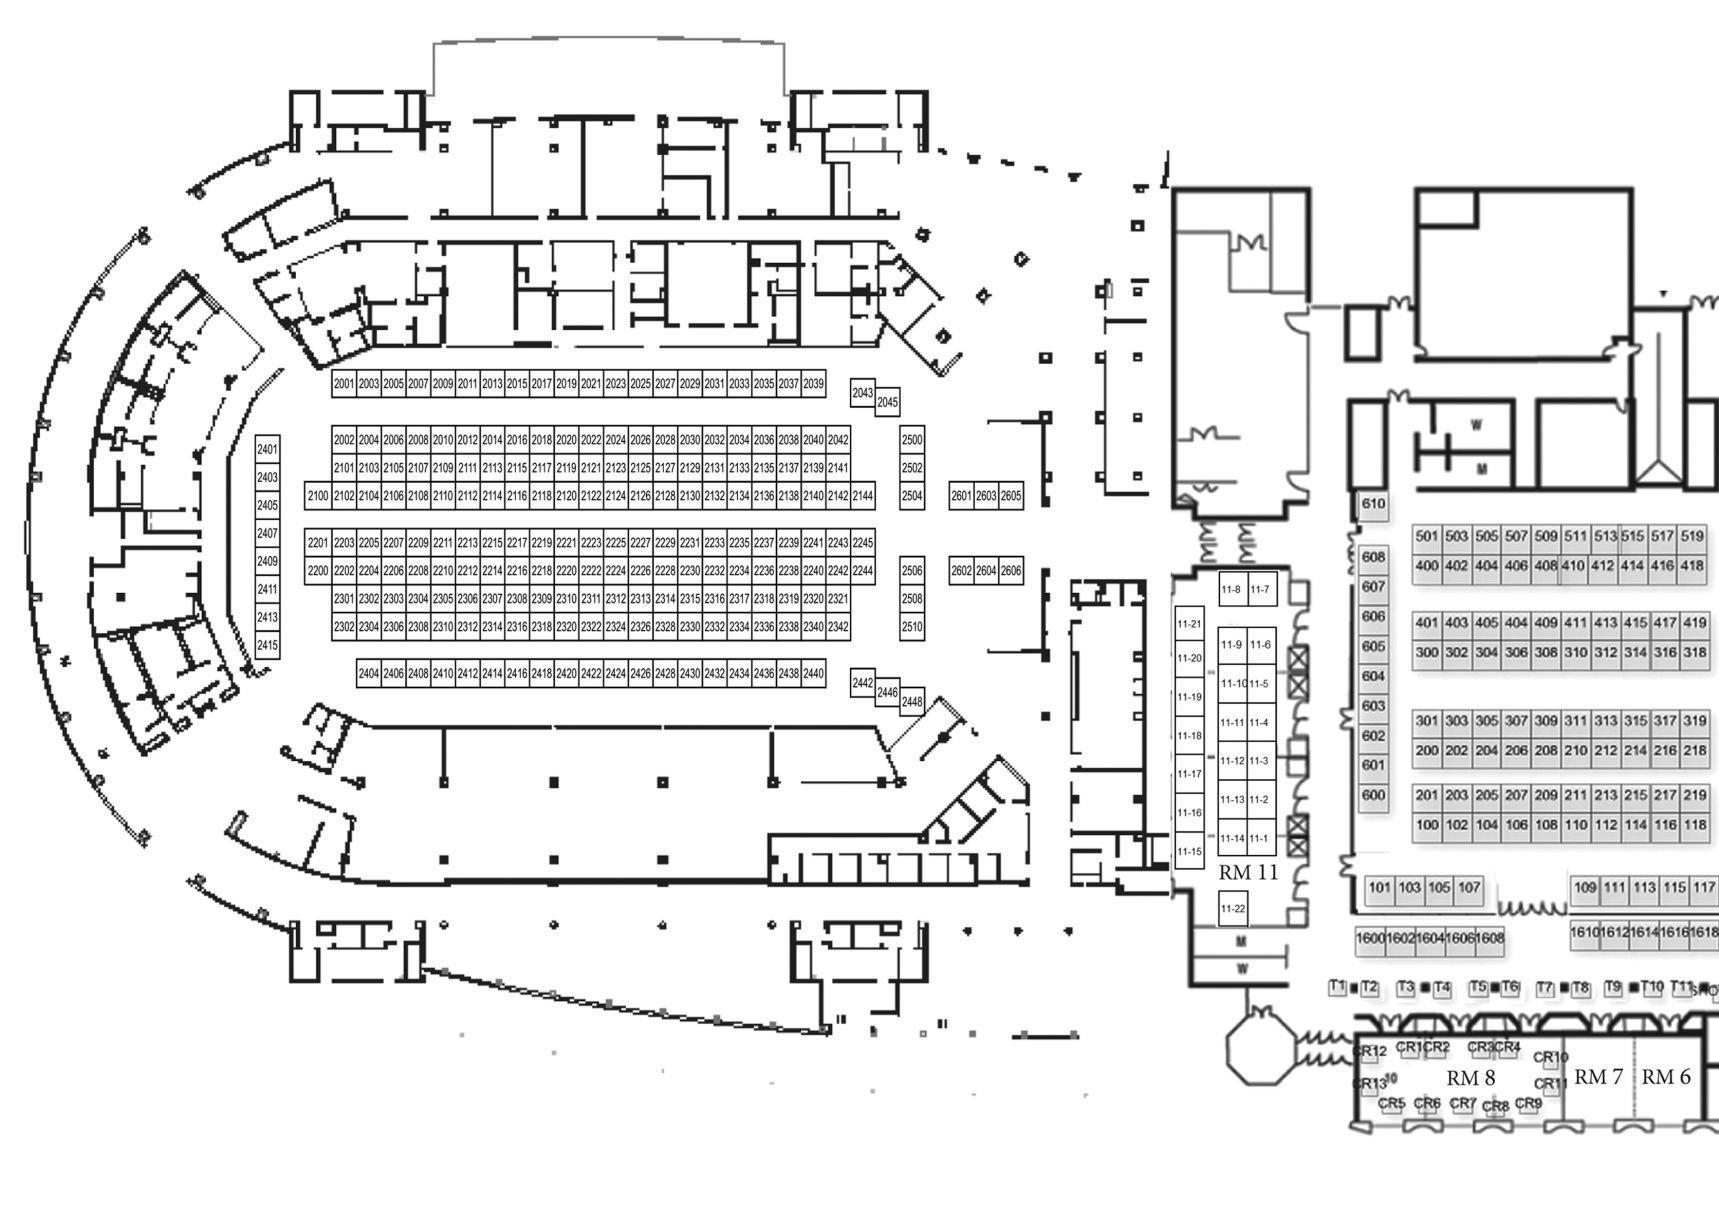 Wiring Diagram PDF: 1620 Cub Cadet Schematic